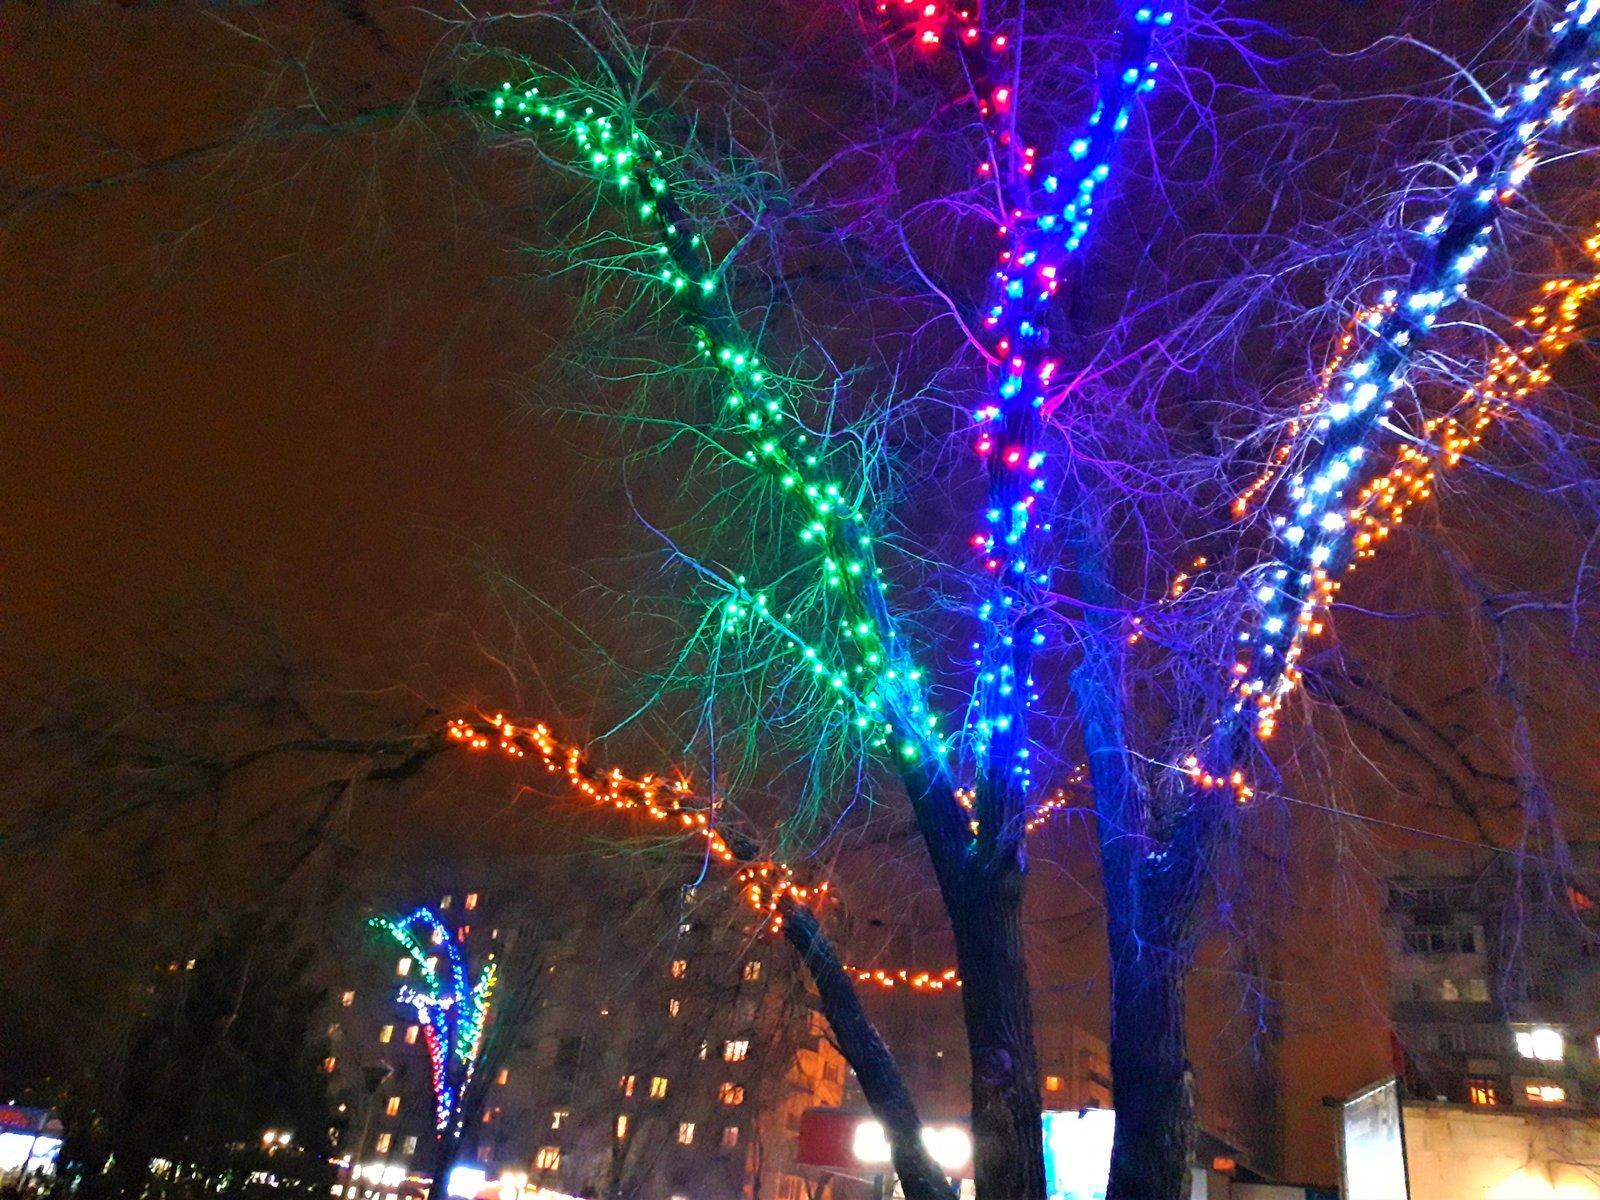 монтаж гирлянд Мелитополь, установка гирлянд на новый год Мелитополь, украсить гирляндами дерево перед магазином Мелитополь, украсить кафе гирляндами Мелитополь